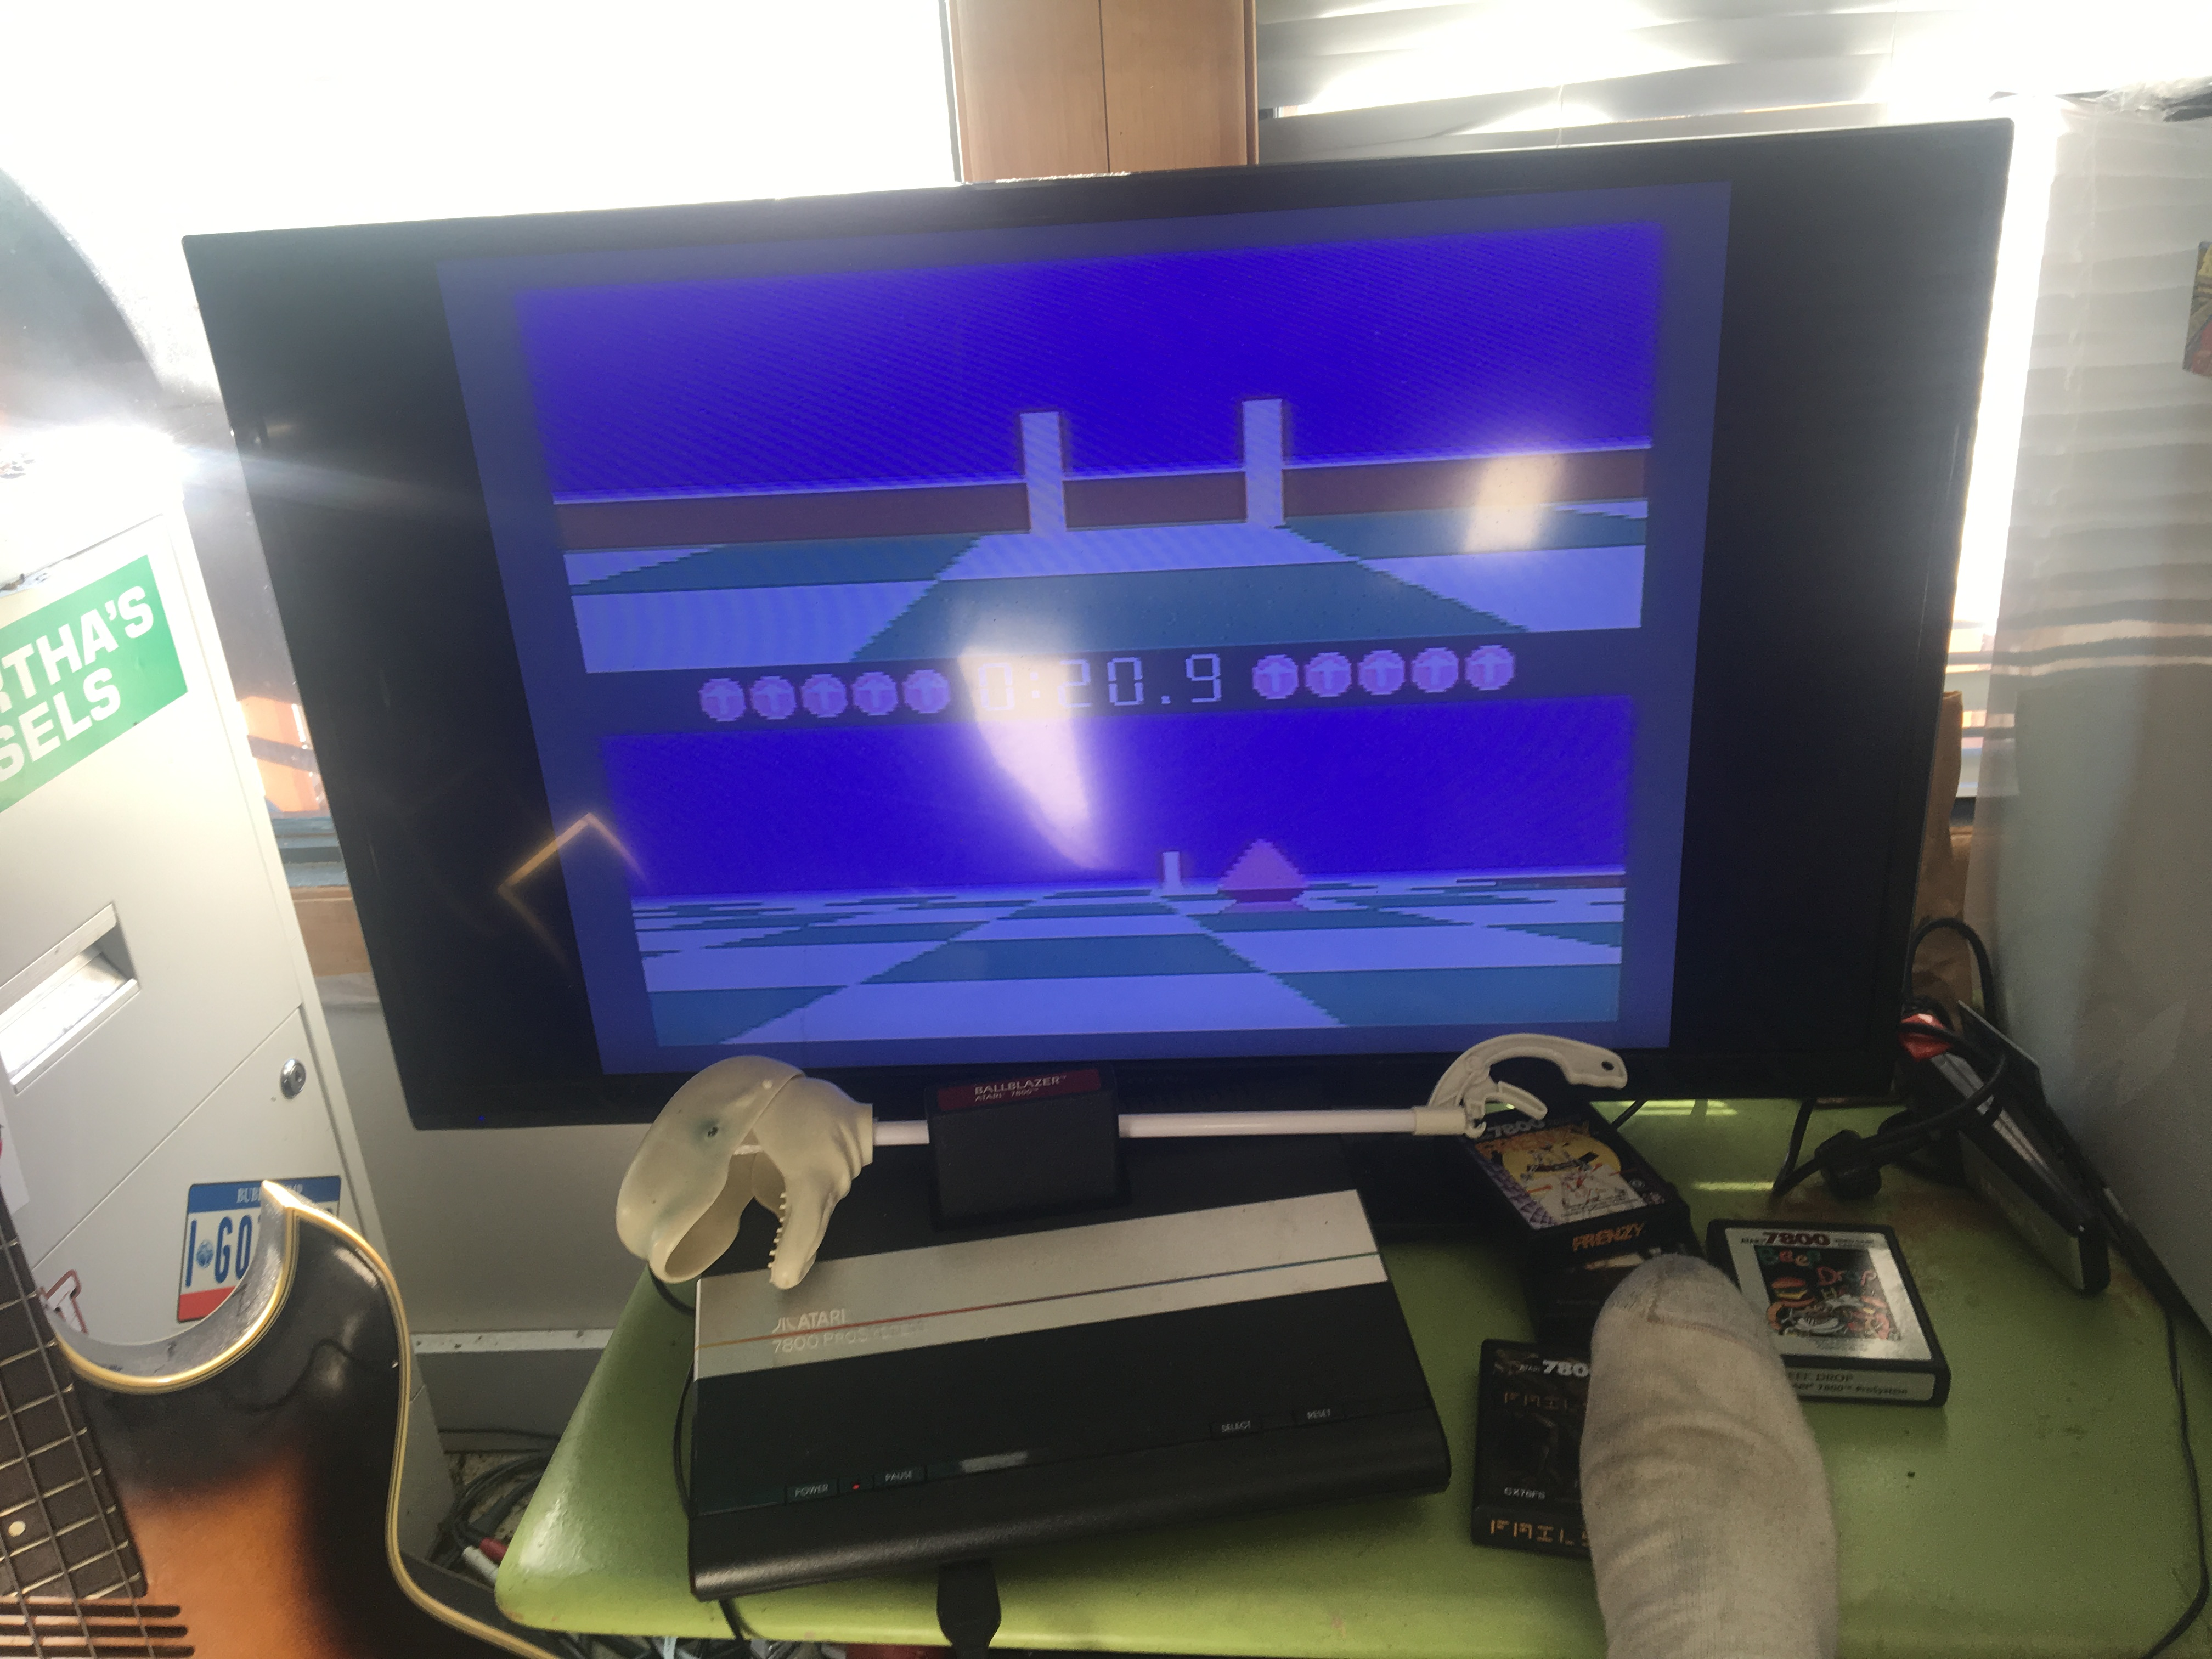 CousinVinnie: Ballblazer: Droid 2 / 1 minute (Atari 7800) 10 points on 2017-11-26 09:27:22